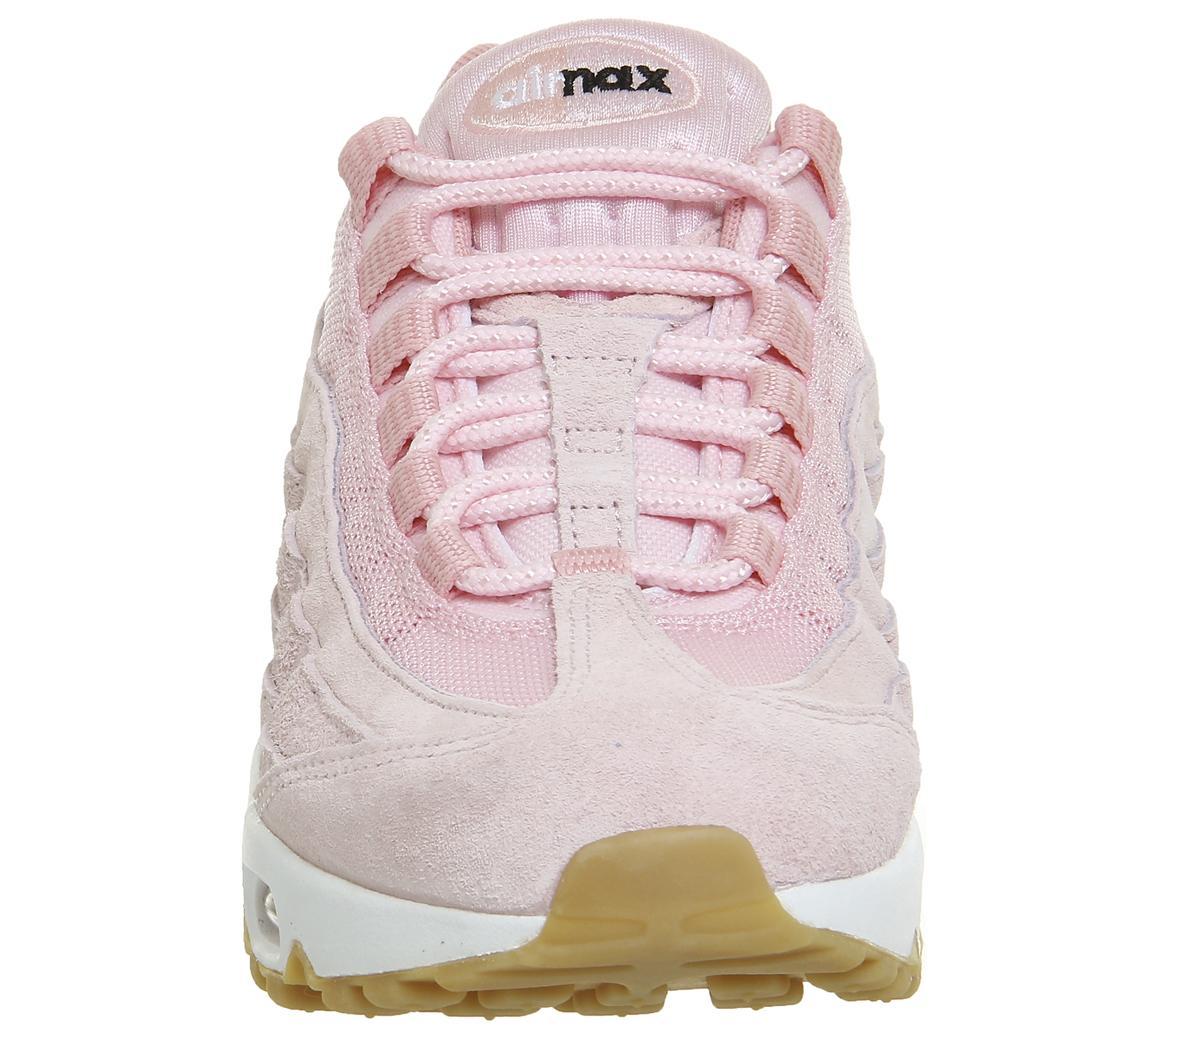 barato Air Max 95 | Платья | Sneakers nike, Sneakers, Nike